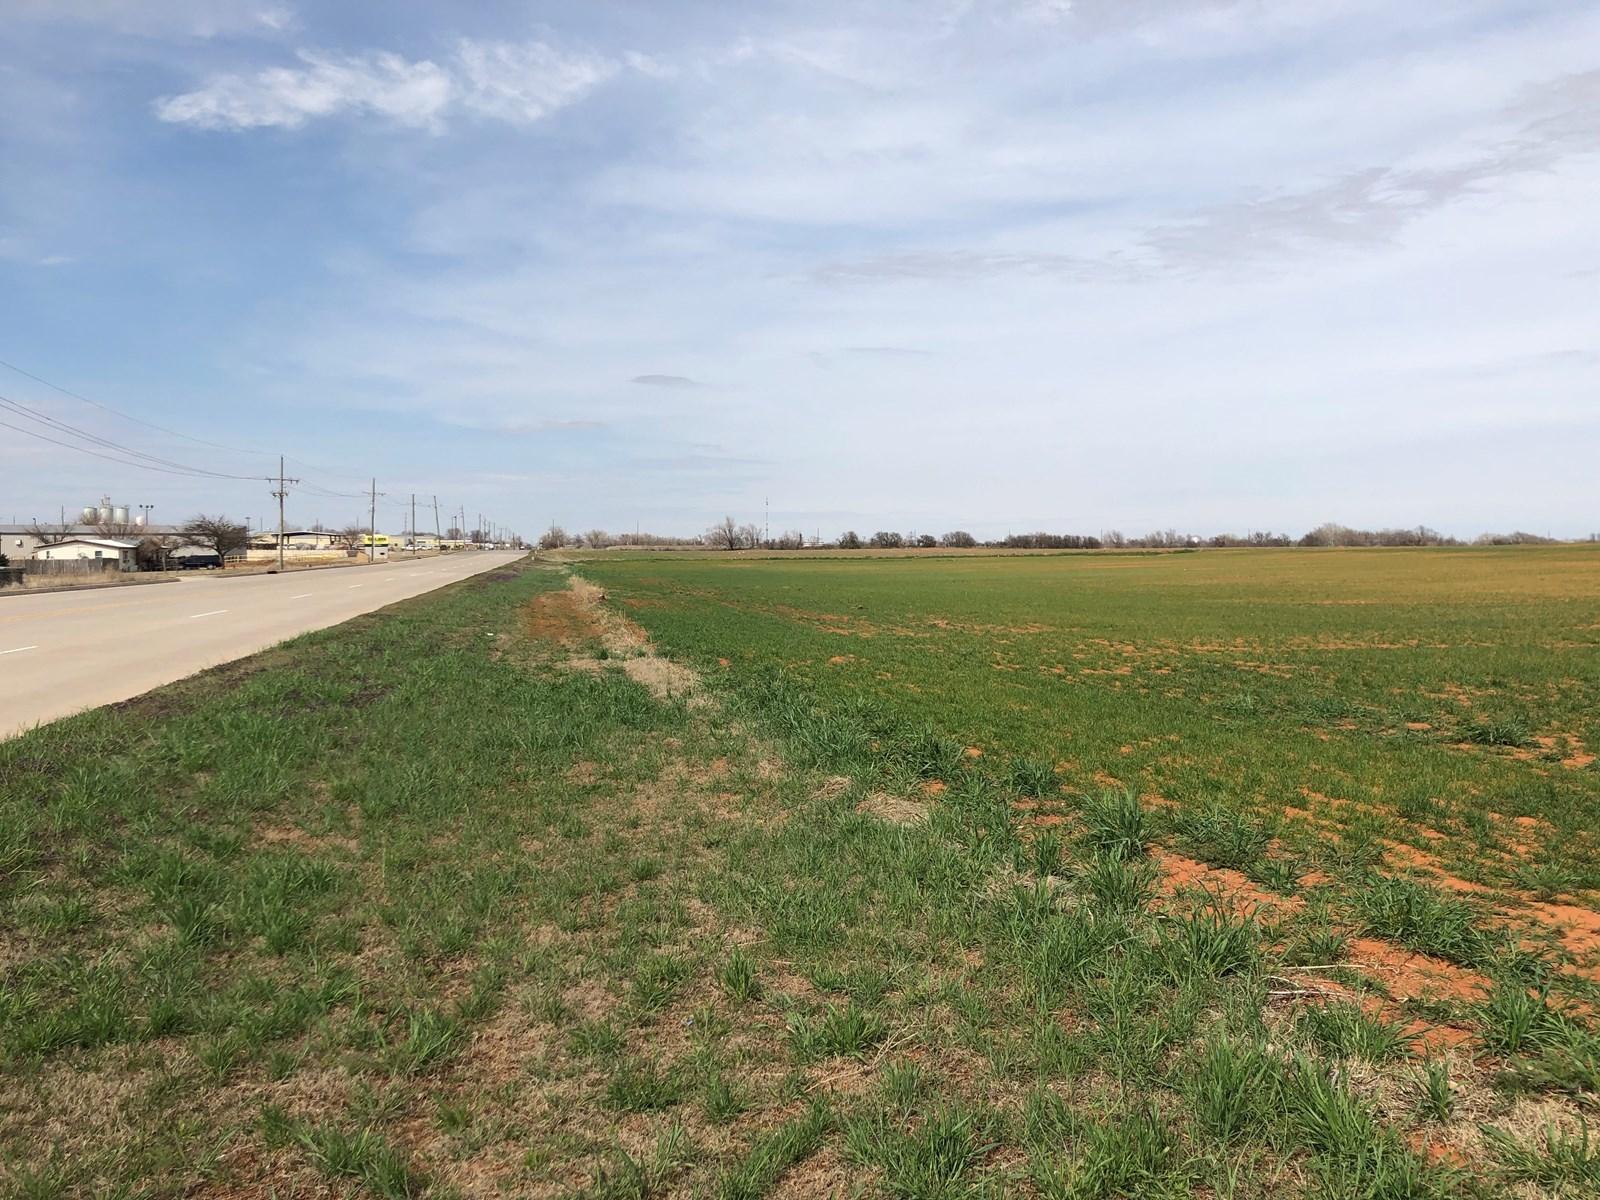 LAND FOR SALE IN ELK CITY, OKLAHOMA